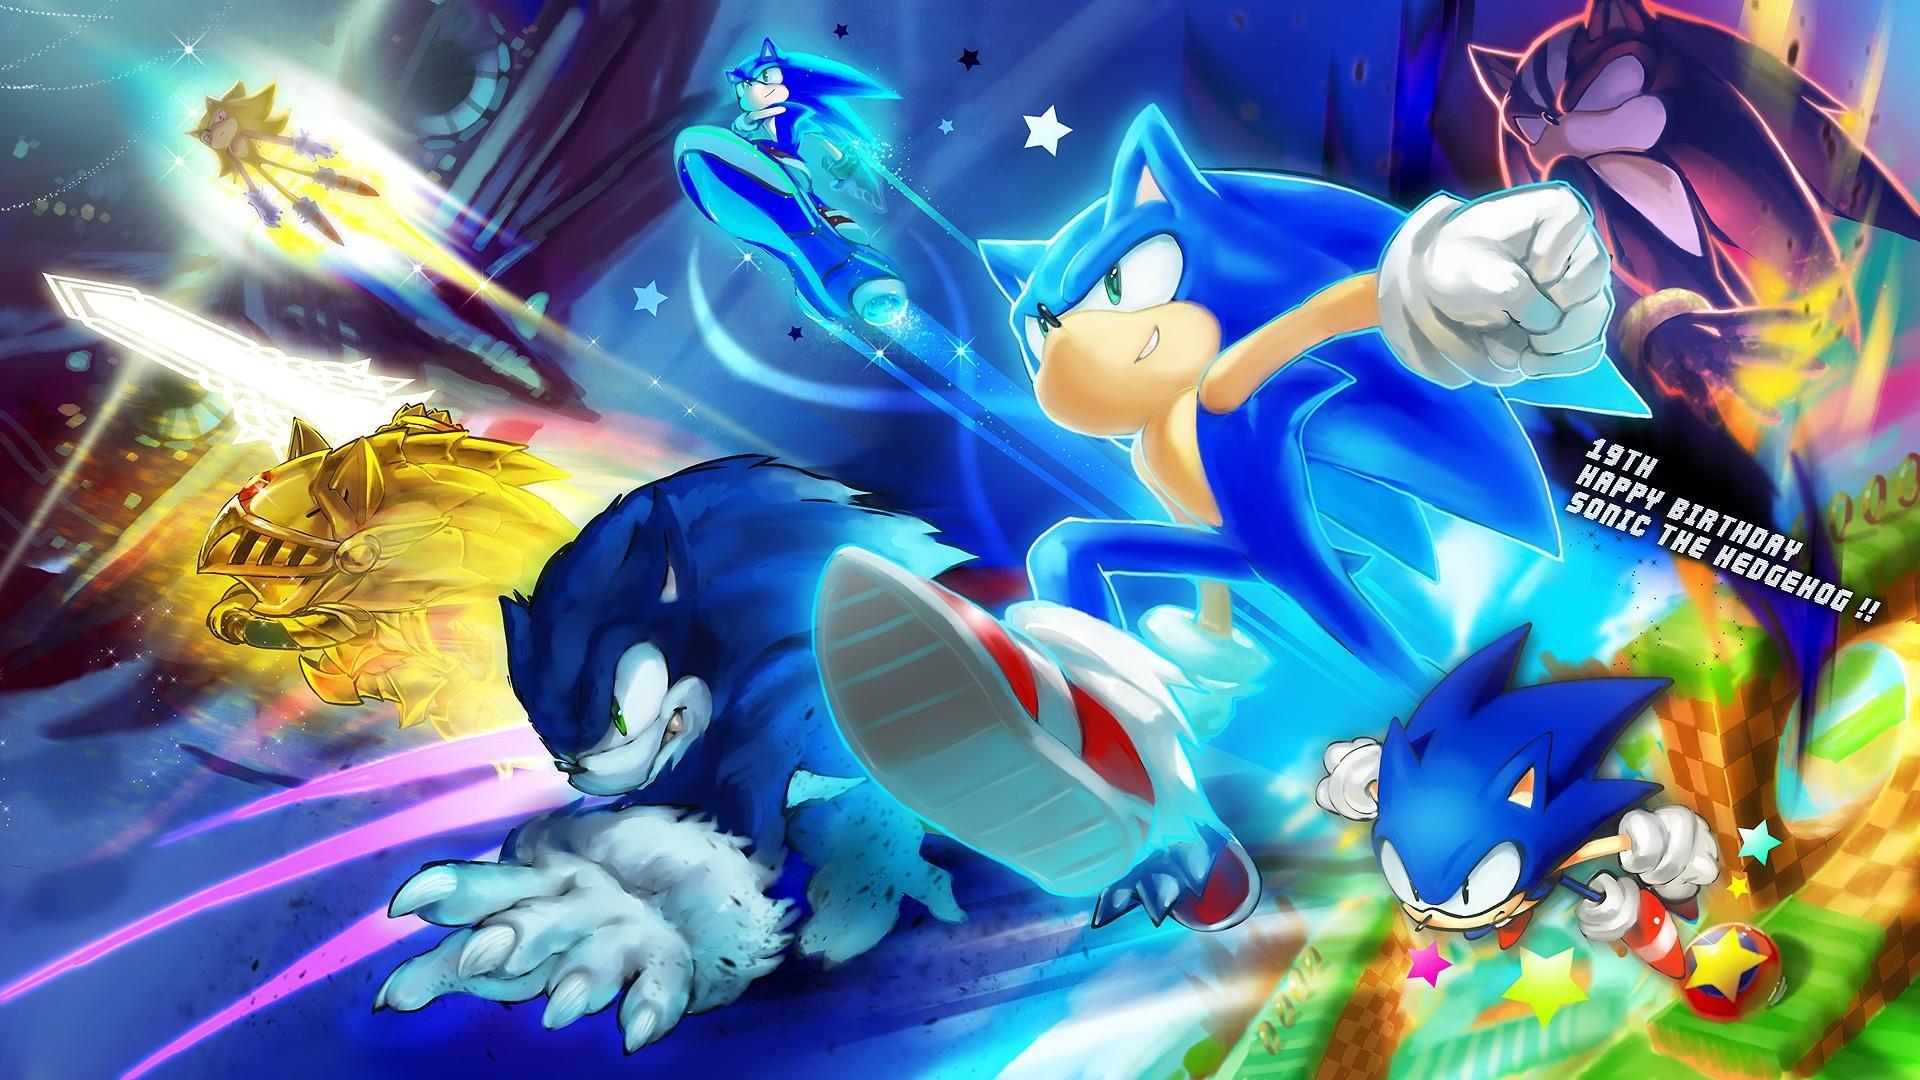 Sonic the Hedgehog · download Sonic the Hedgehog image